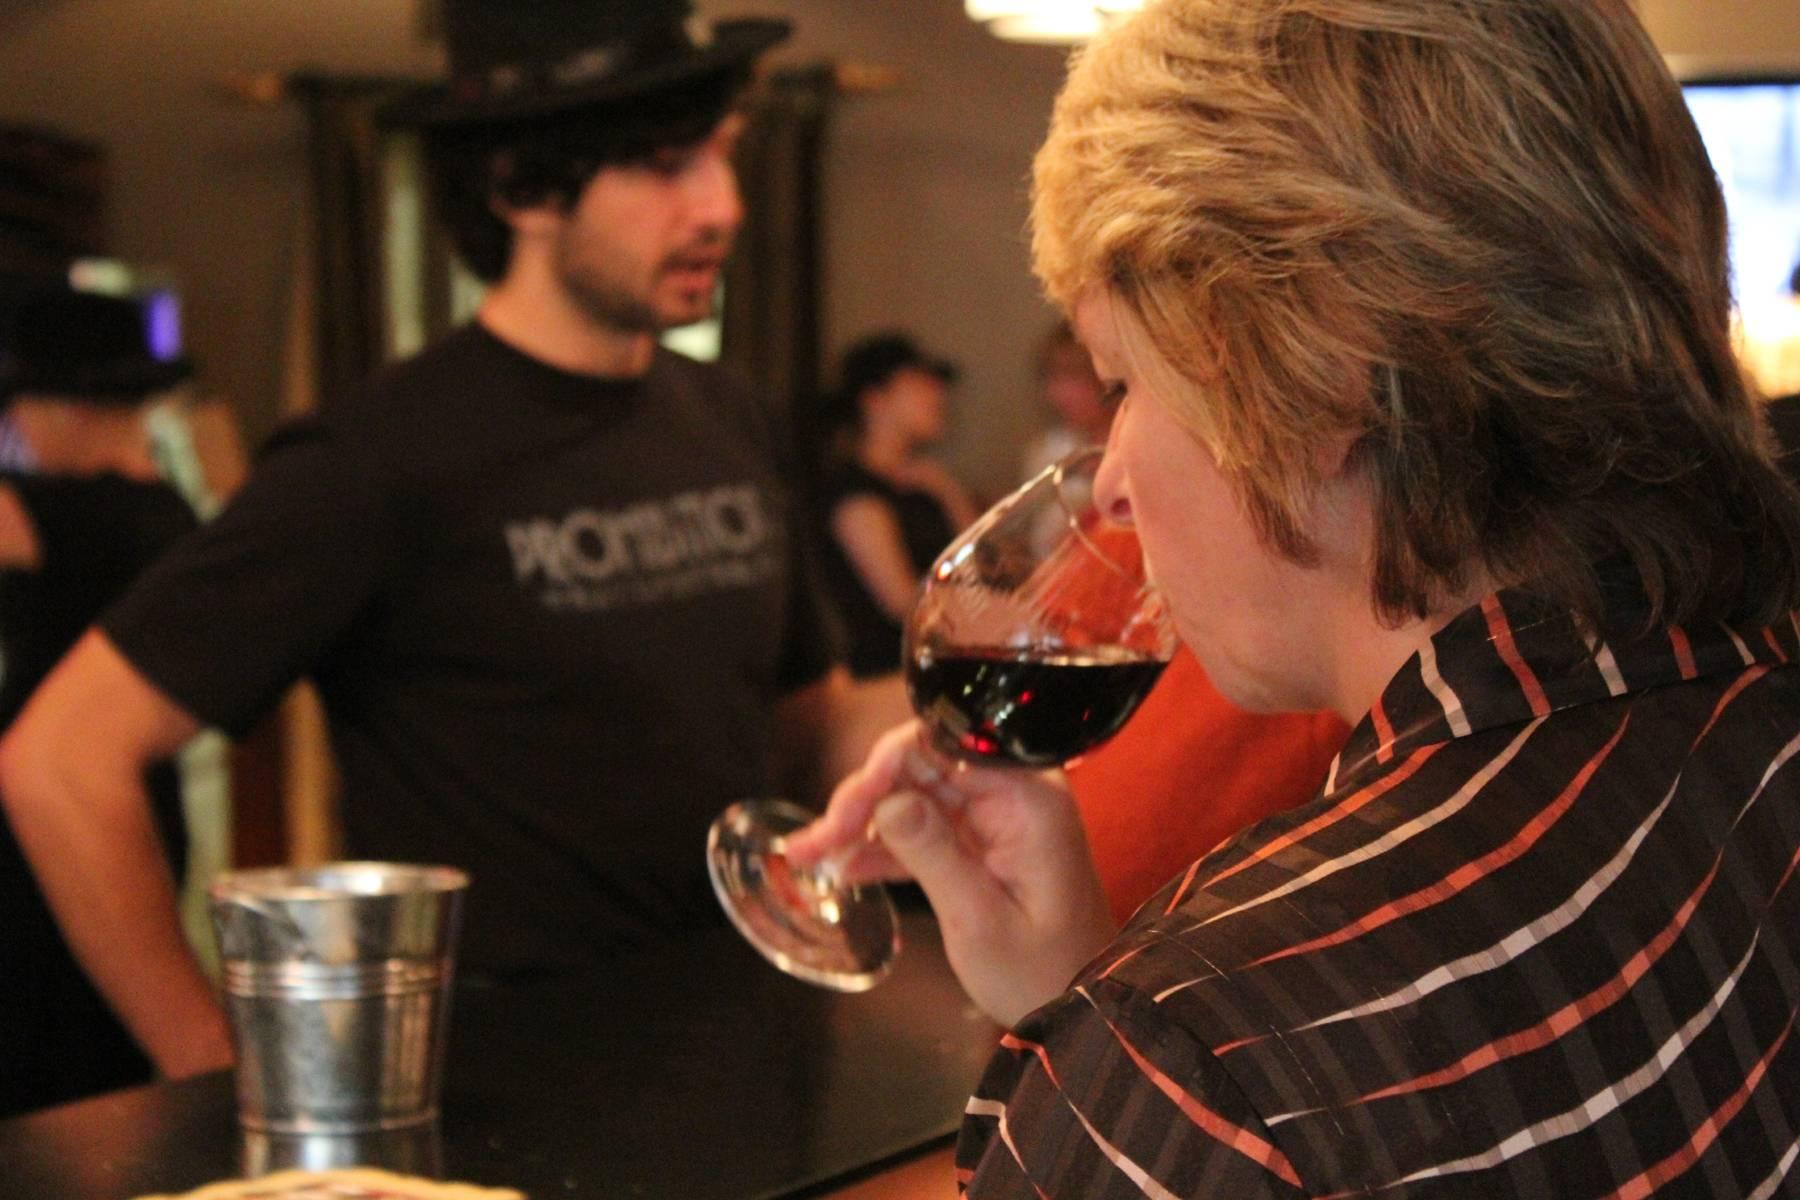 Prohibition_-_The_Speakeasy_Wine_Club